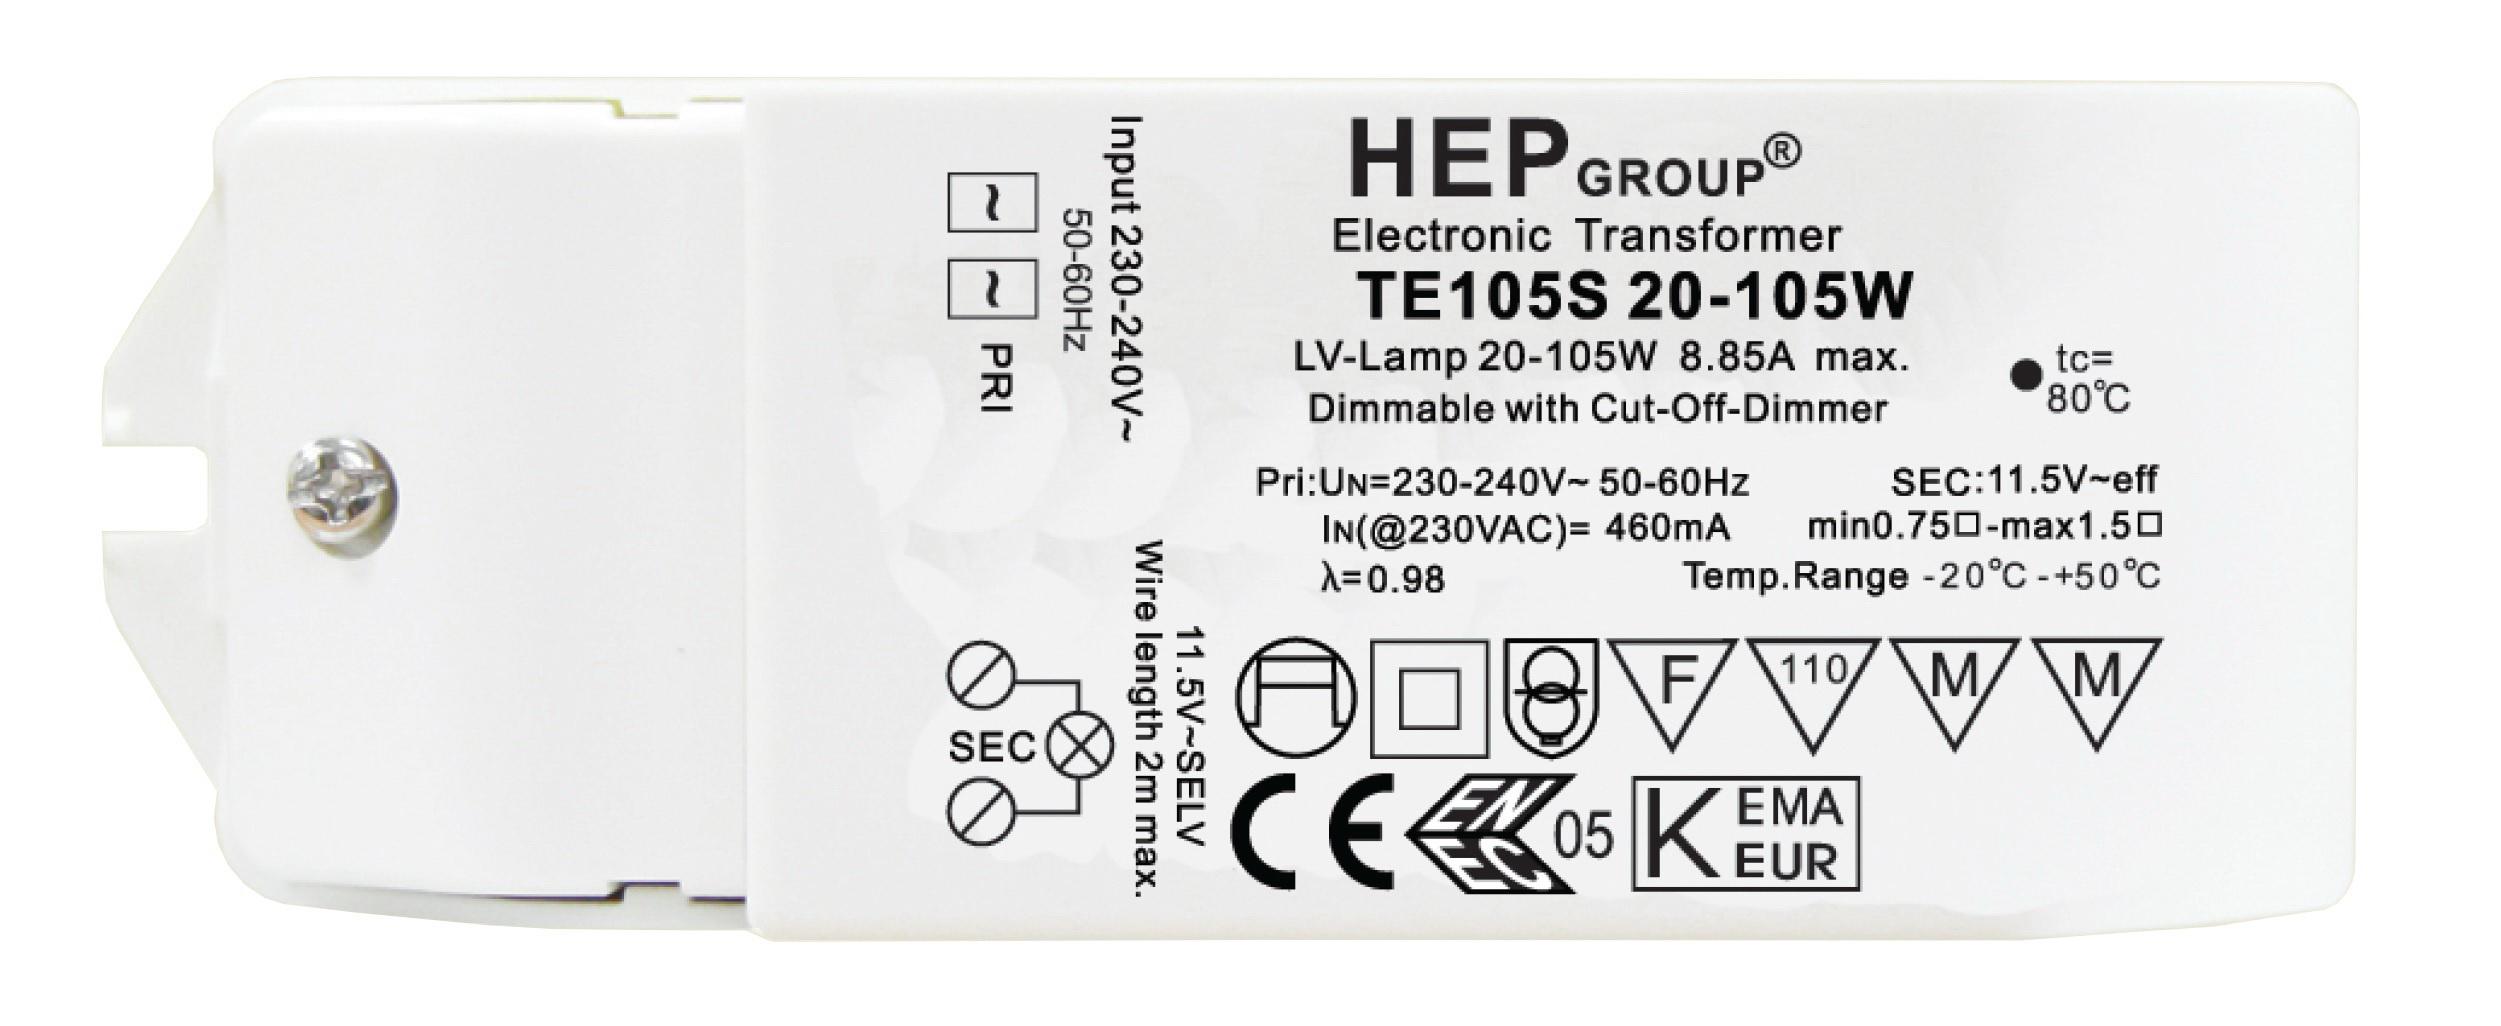 1 Stk Elektronischer Transformator, 240/12V, 50-210VA, Dimm LI5ZTL210S